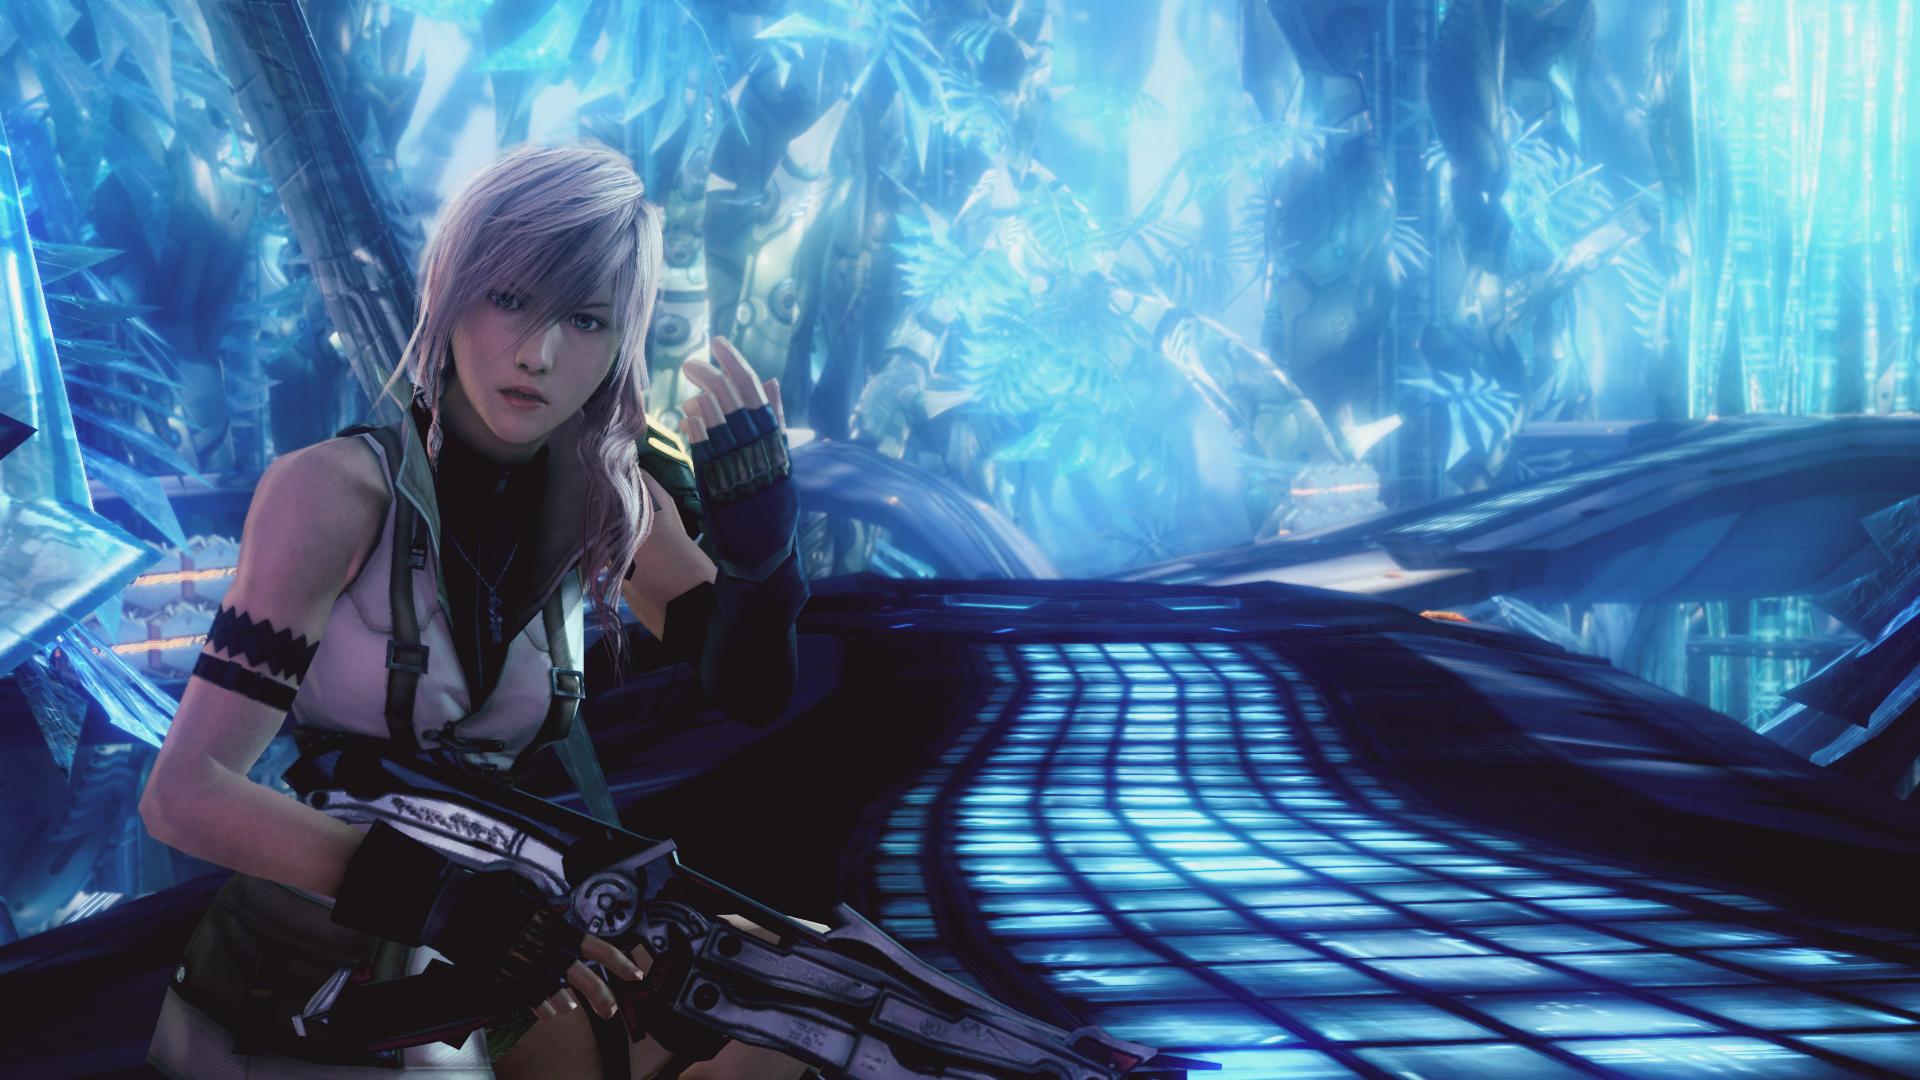 Wallpaper Video Games Final Fantasy Xiii Claire Farron Long